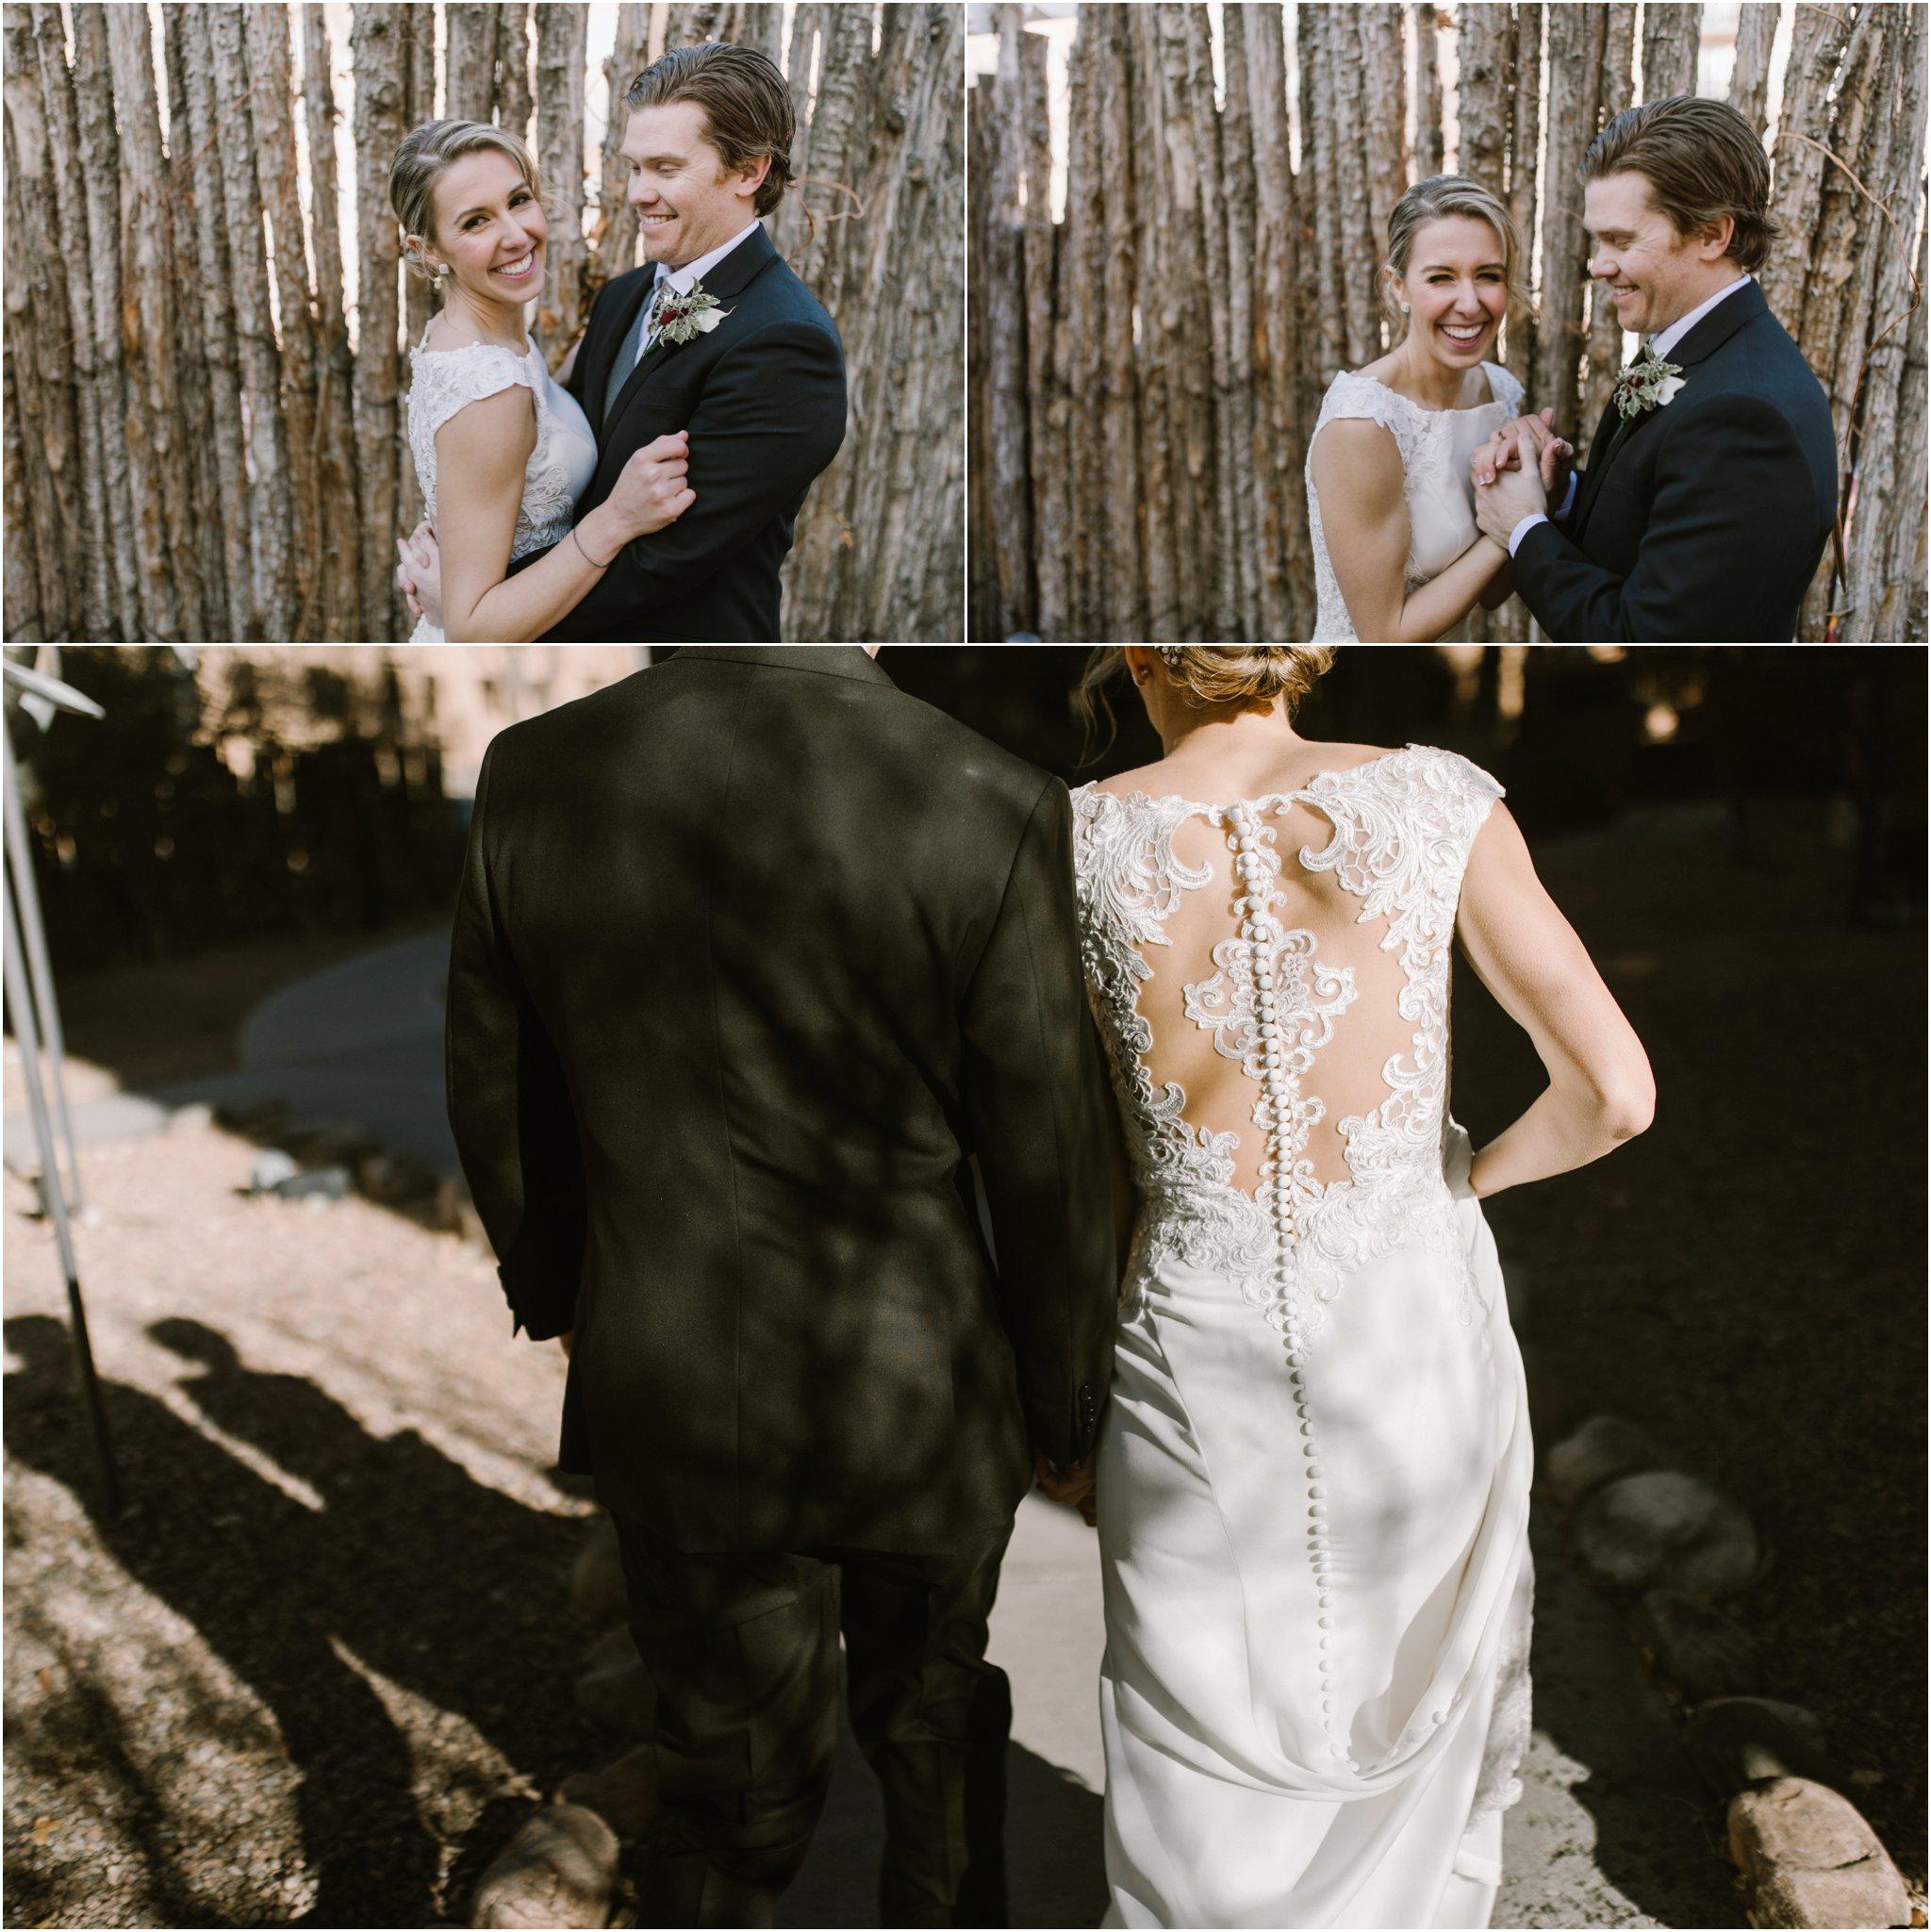 0904Loretto Chapel Wedding, Inn and Spa at Loretto wedding, Santa Fe wedding photographers, blue rose photography